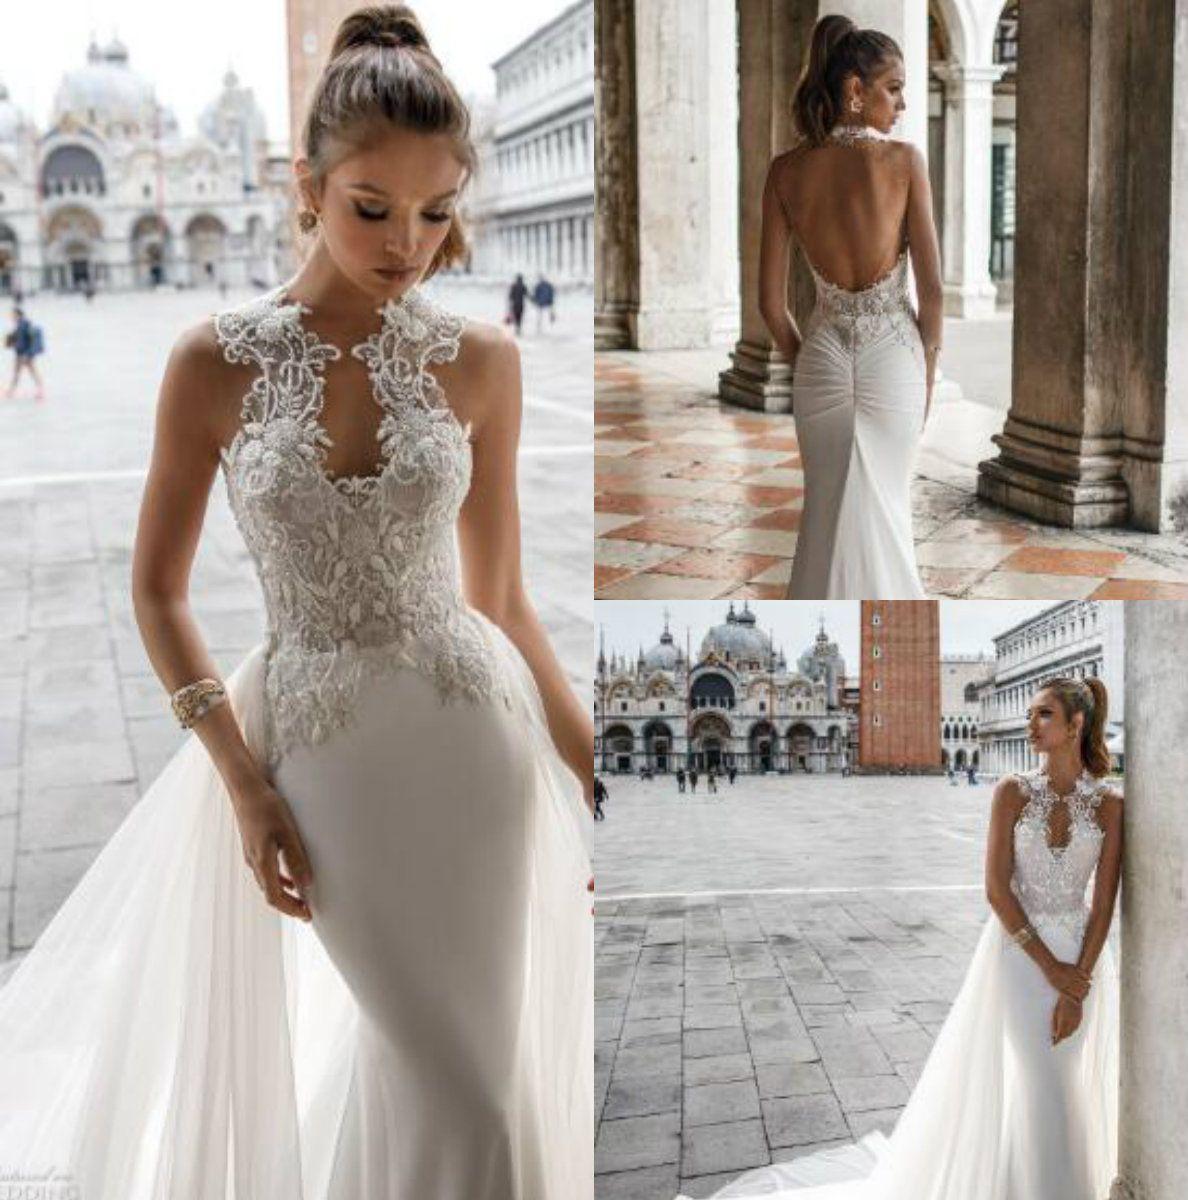 2018 Julie Vino Vintage Mermaid Wedding Dresses Backless Lace Bridal